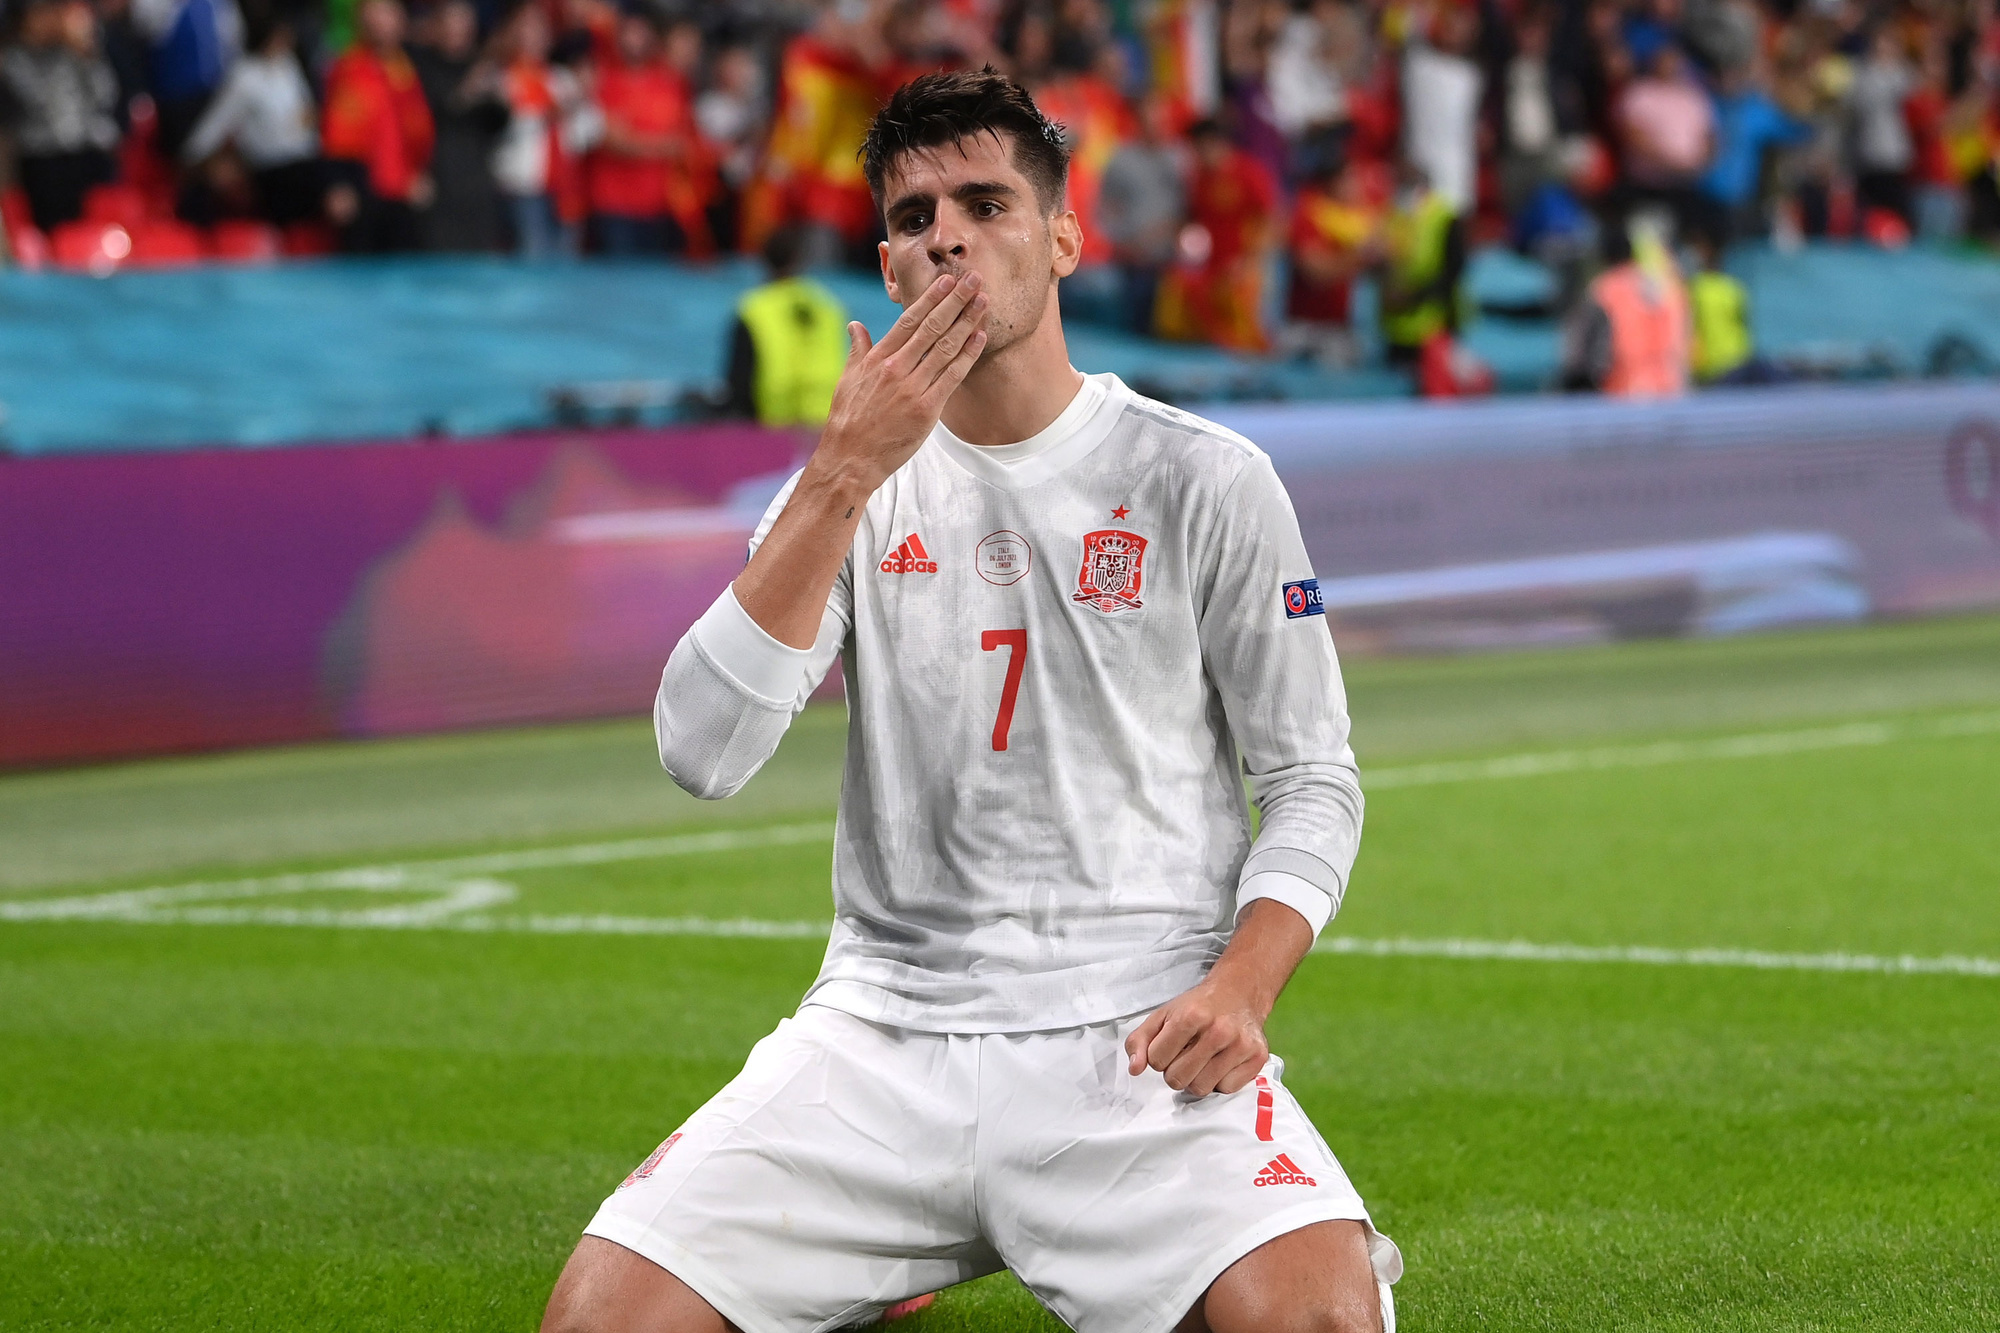 Alvaro Morata, invaller, doelpuntenmaker, miste later zijn penalty, Reuters